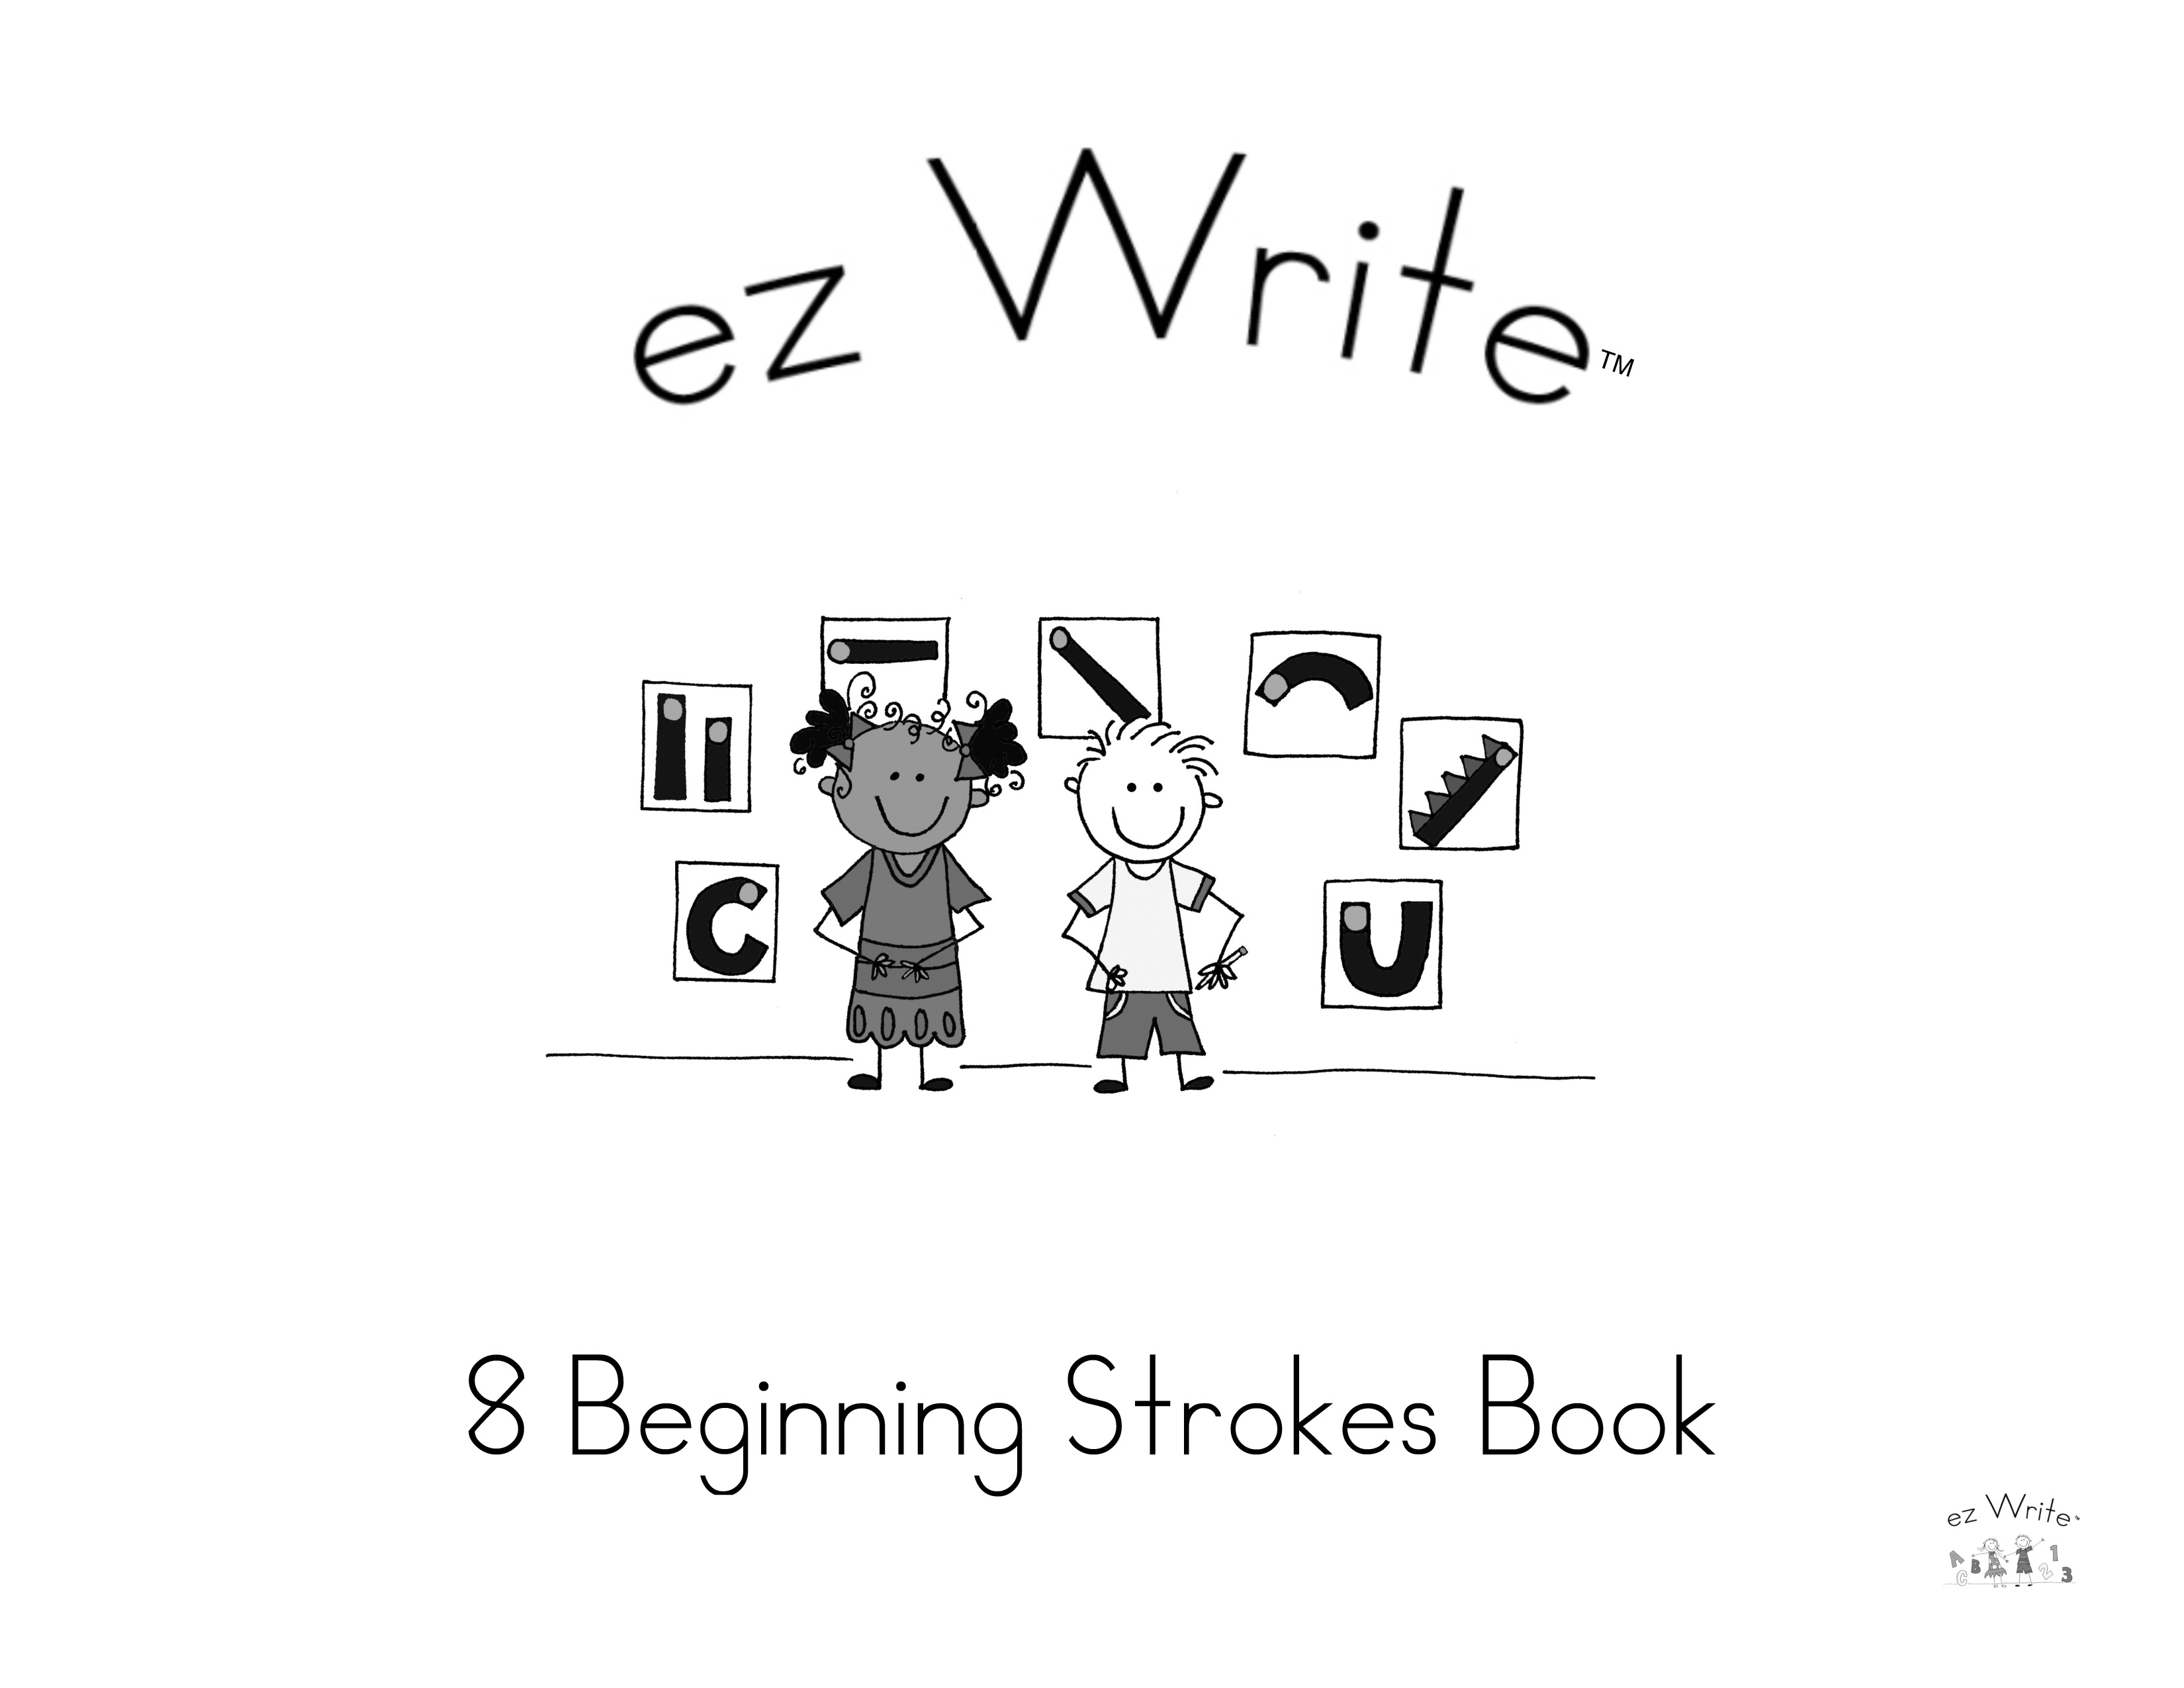 Ez Write Unique Features